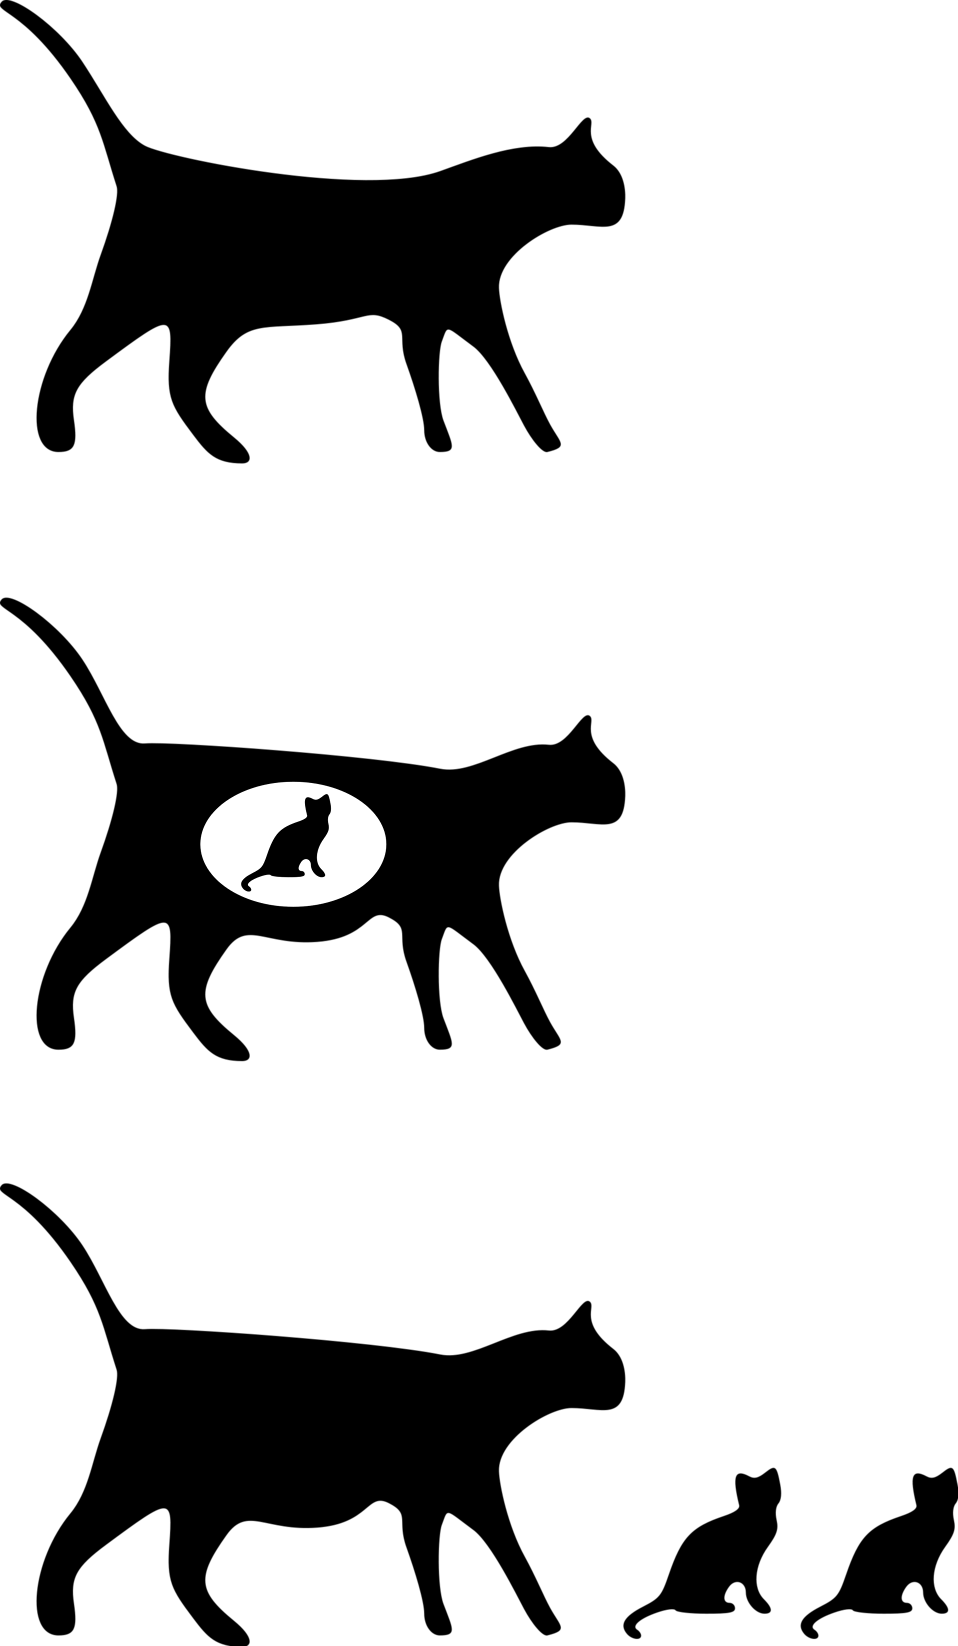 Clipart cat illustration. Cats free stock photo